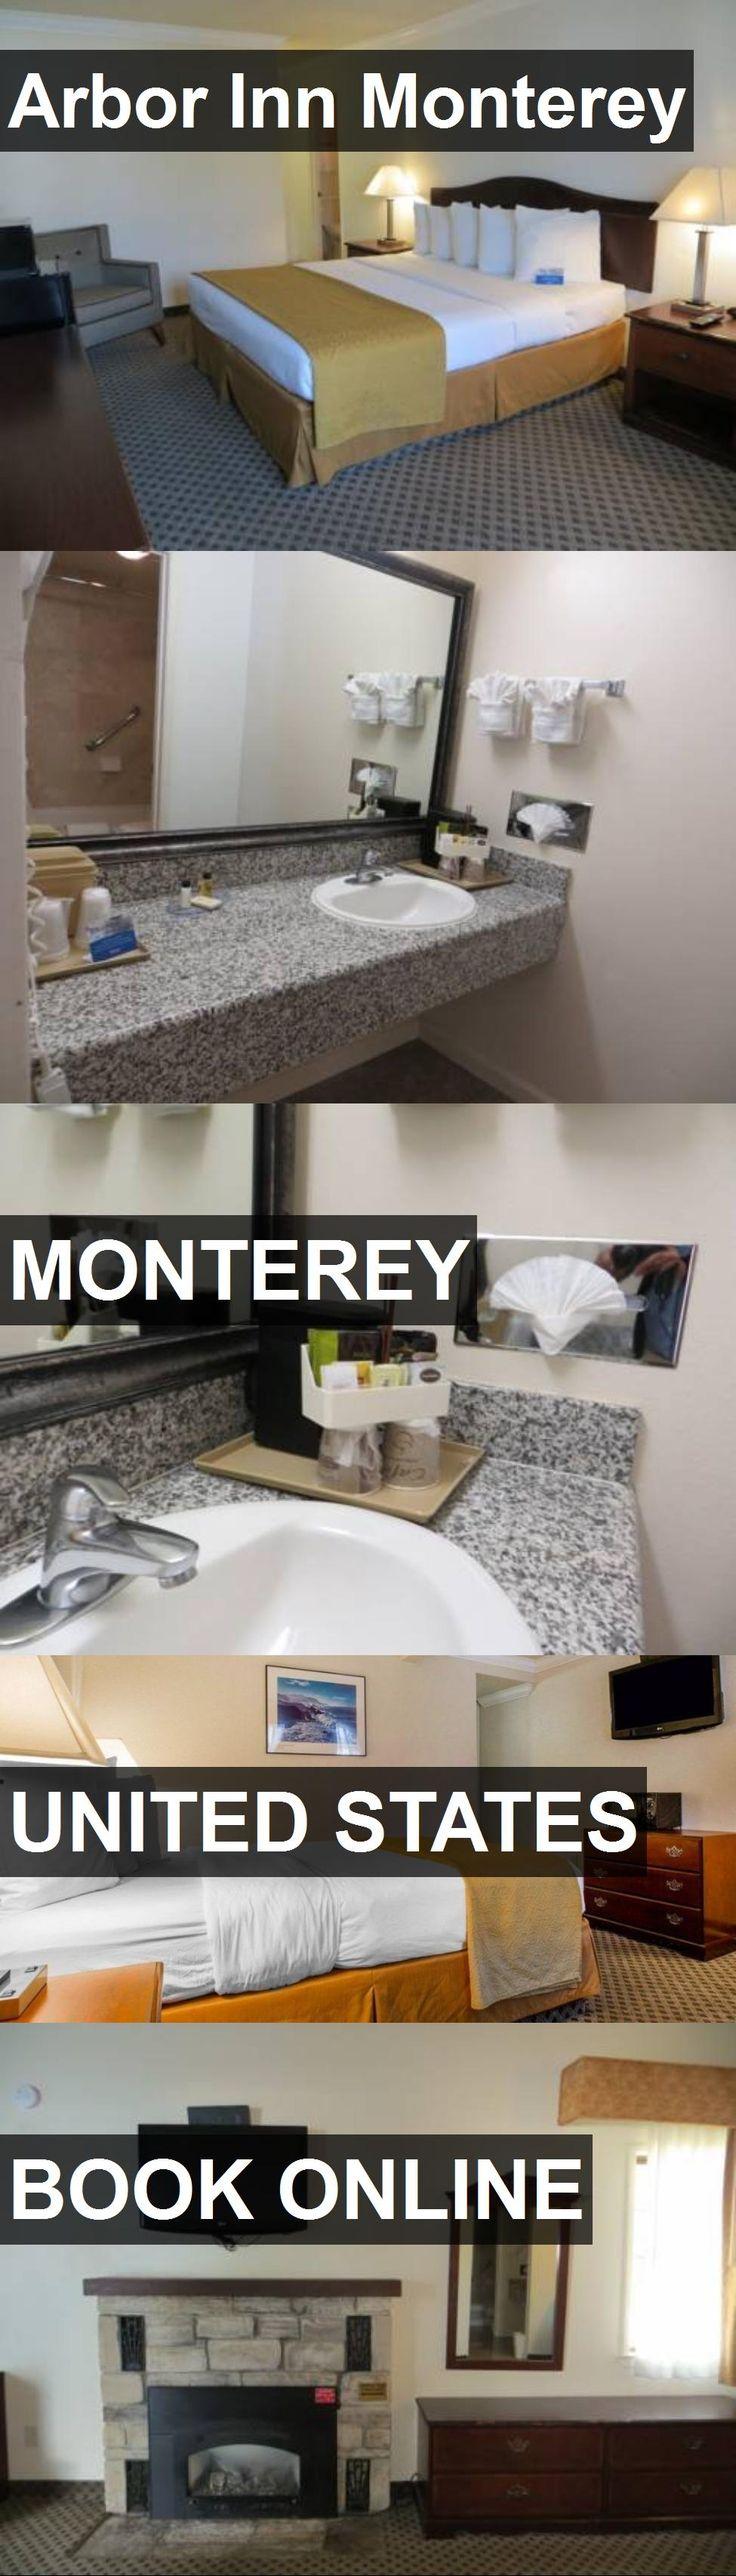 San Jose Monterey Map%0A Hotel Arbor Inn Monterey in Monterey  United States  For more information   photos